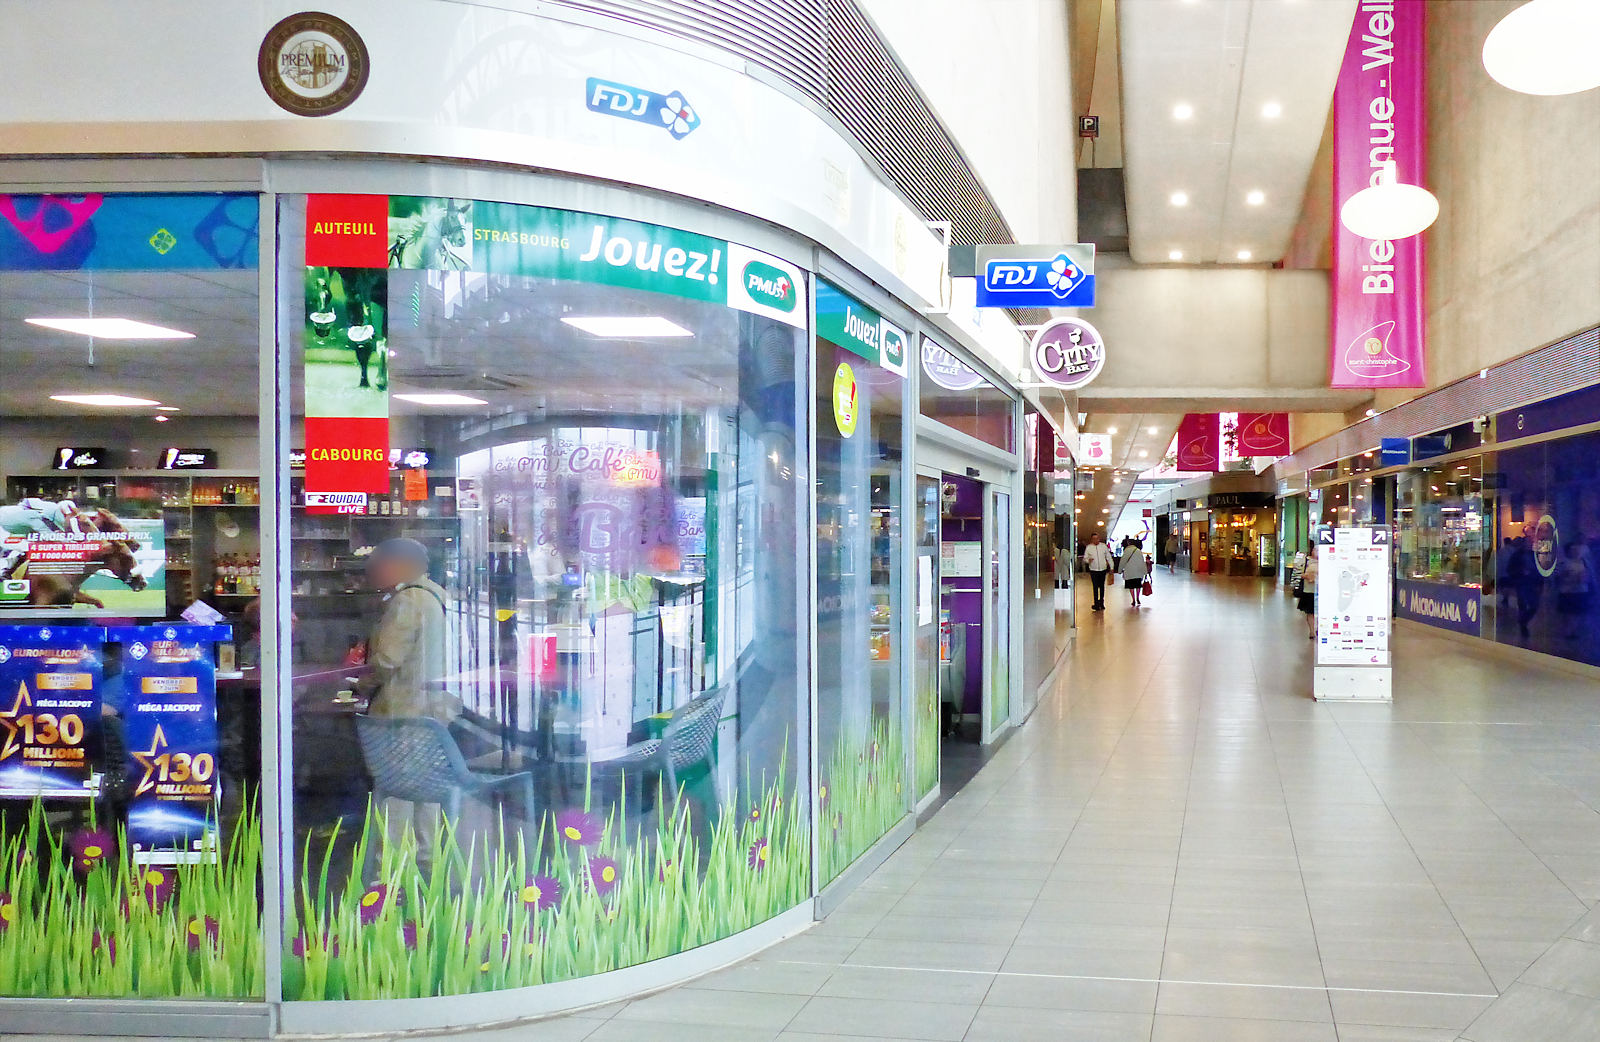 Galerie Commerciale Espace Saint Christophe - Tourcoing